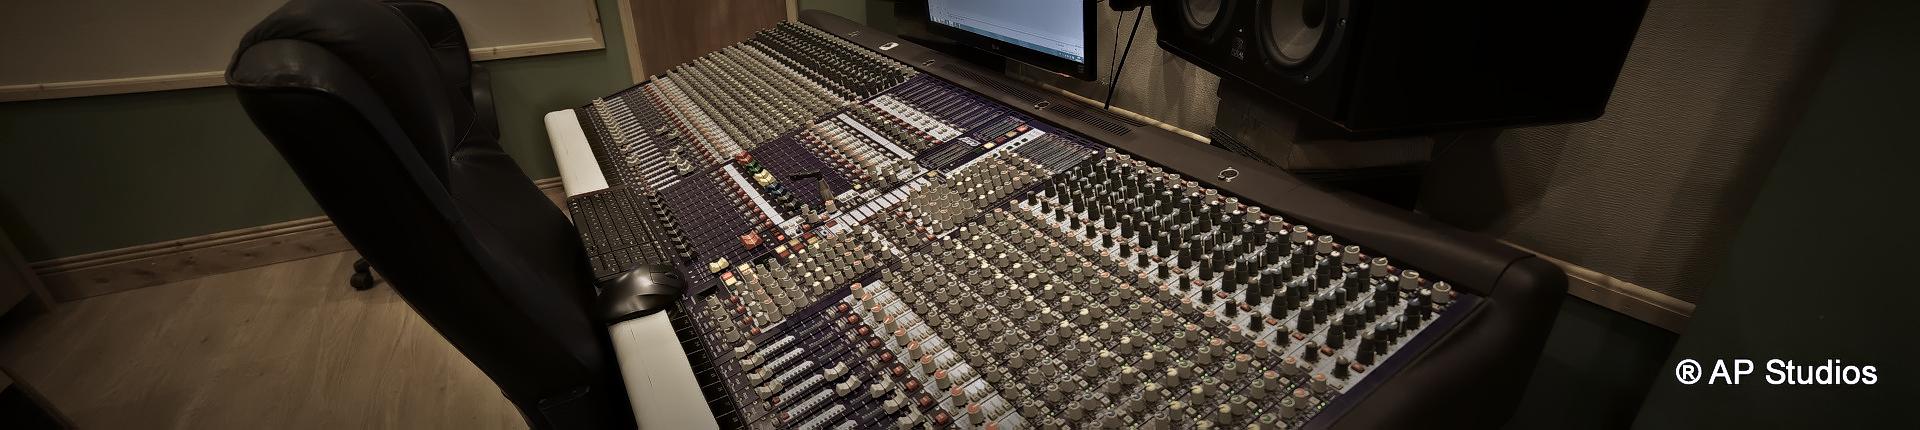 AP Recording Studios Dublin Midas Heritage 1000 Desk side view